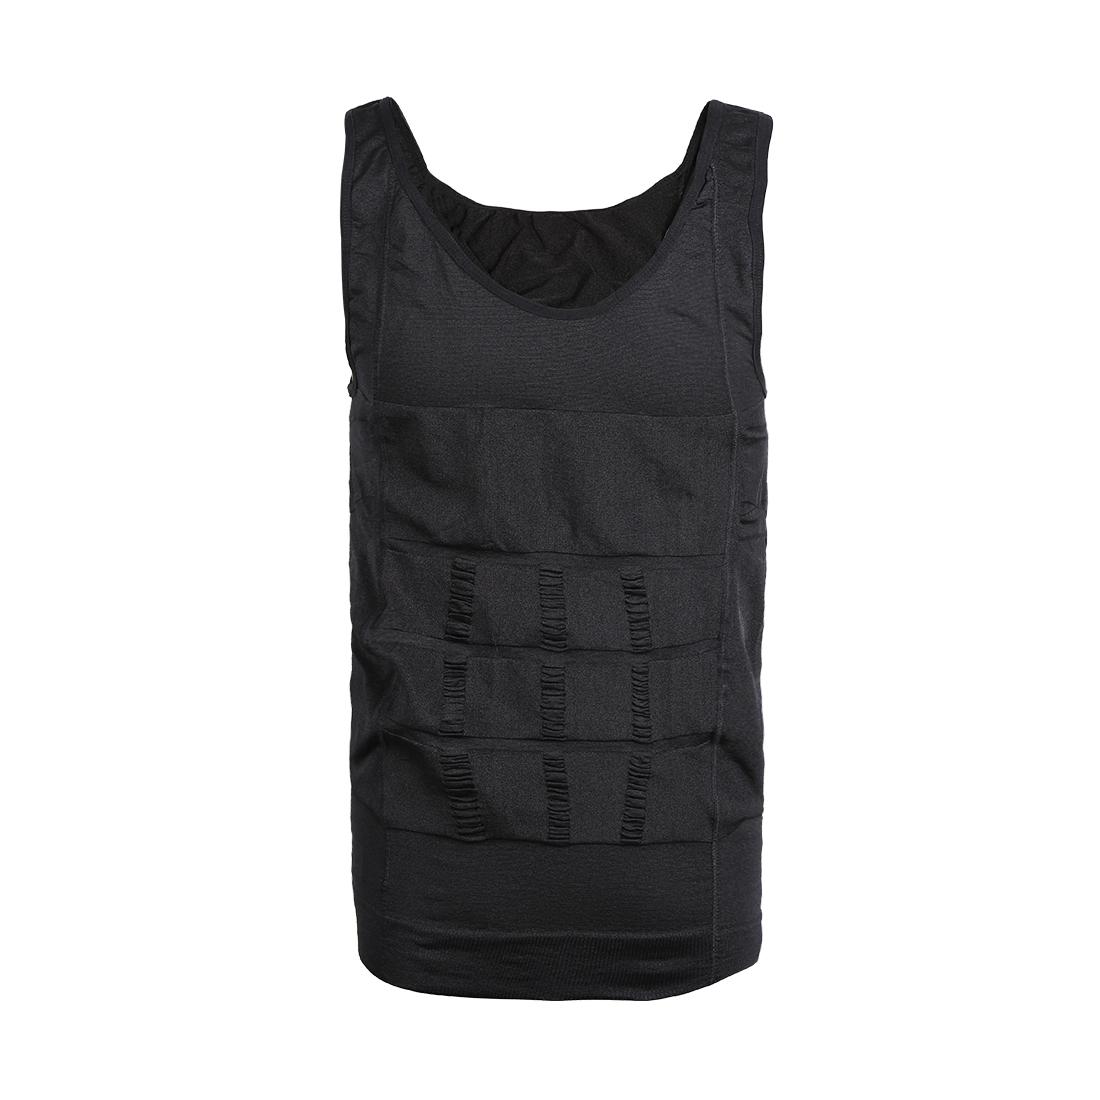 Men Compression Slimming Body Tummy Waist Shapewear Tank Top Black XX-Large